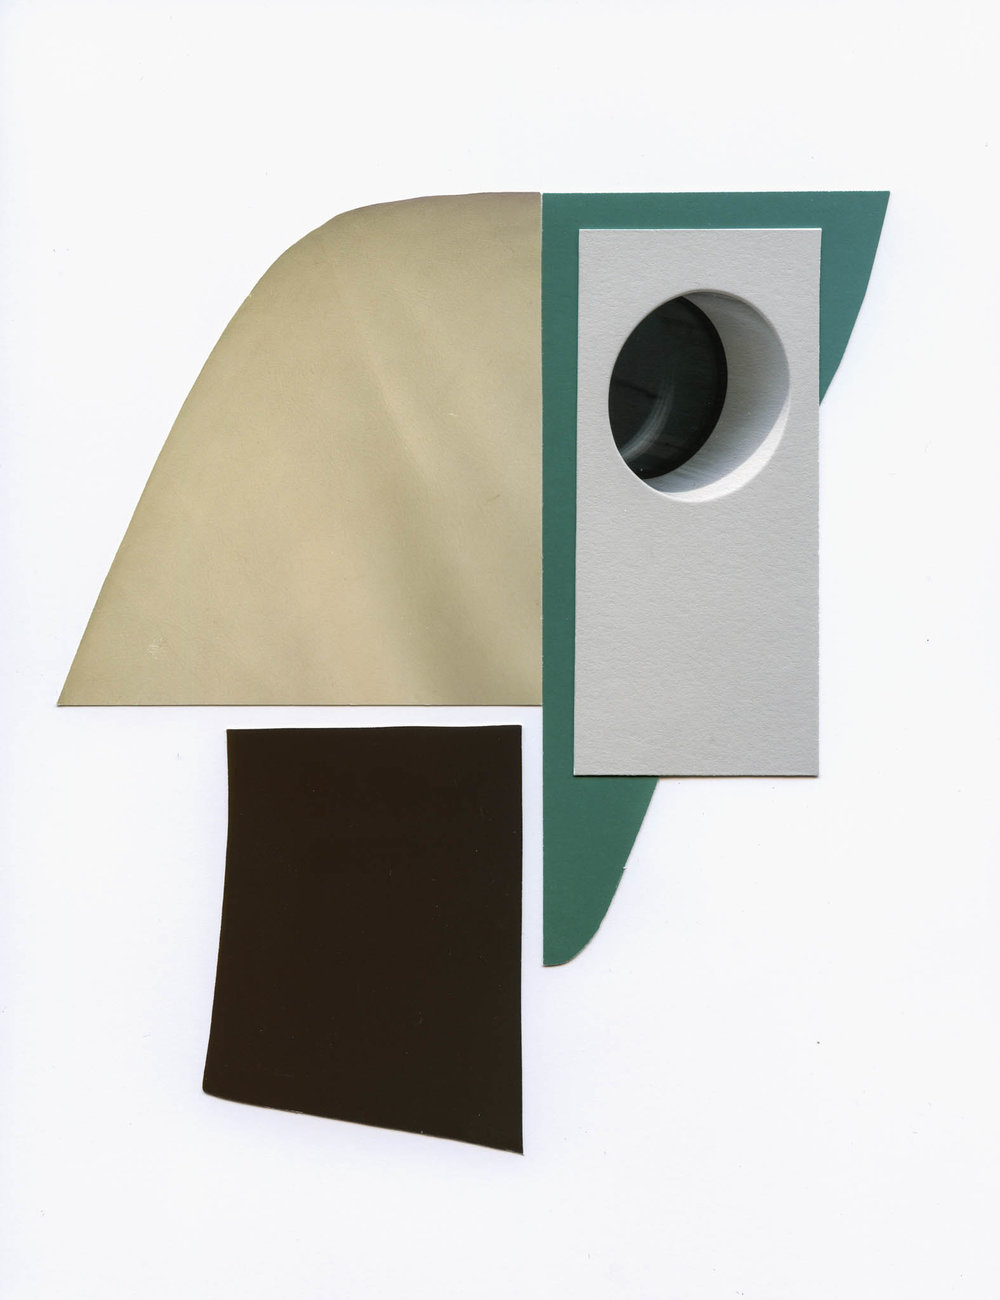 squarespace-19.jpg